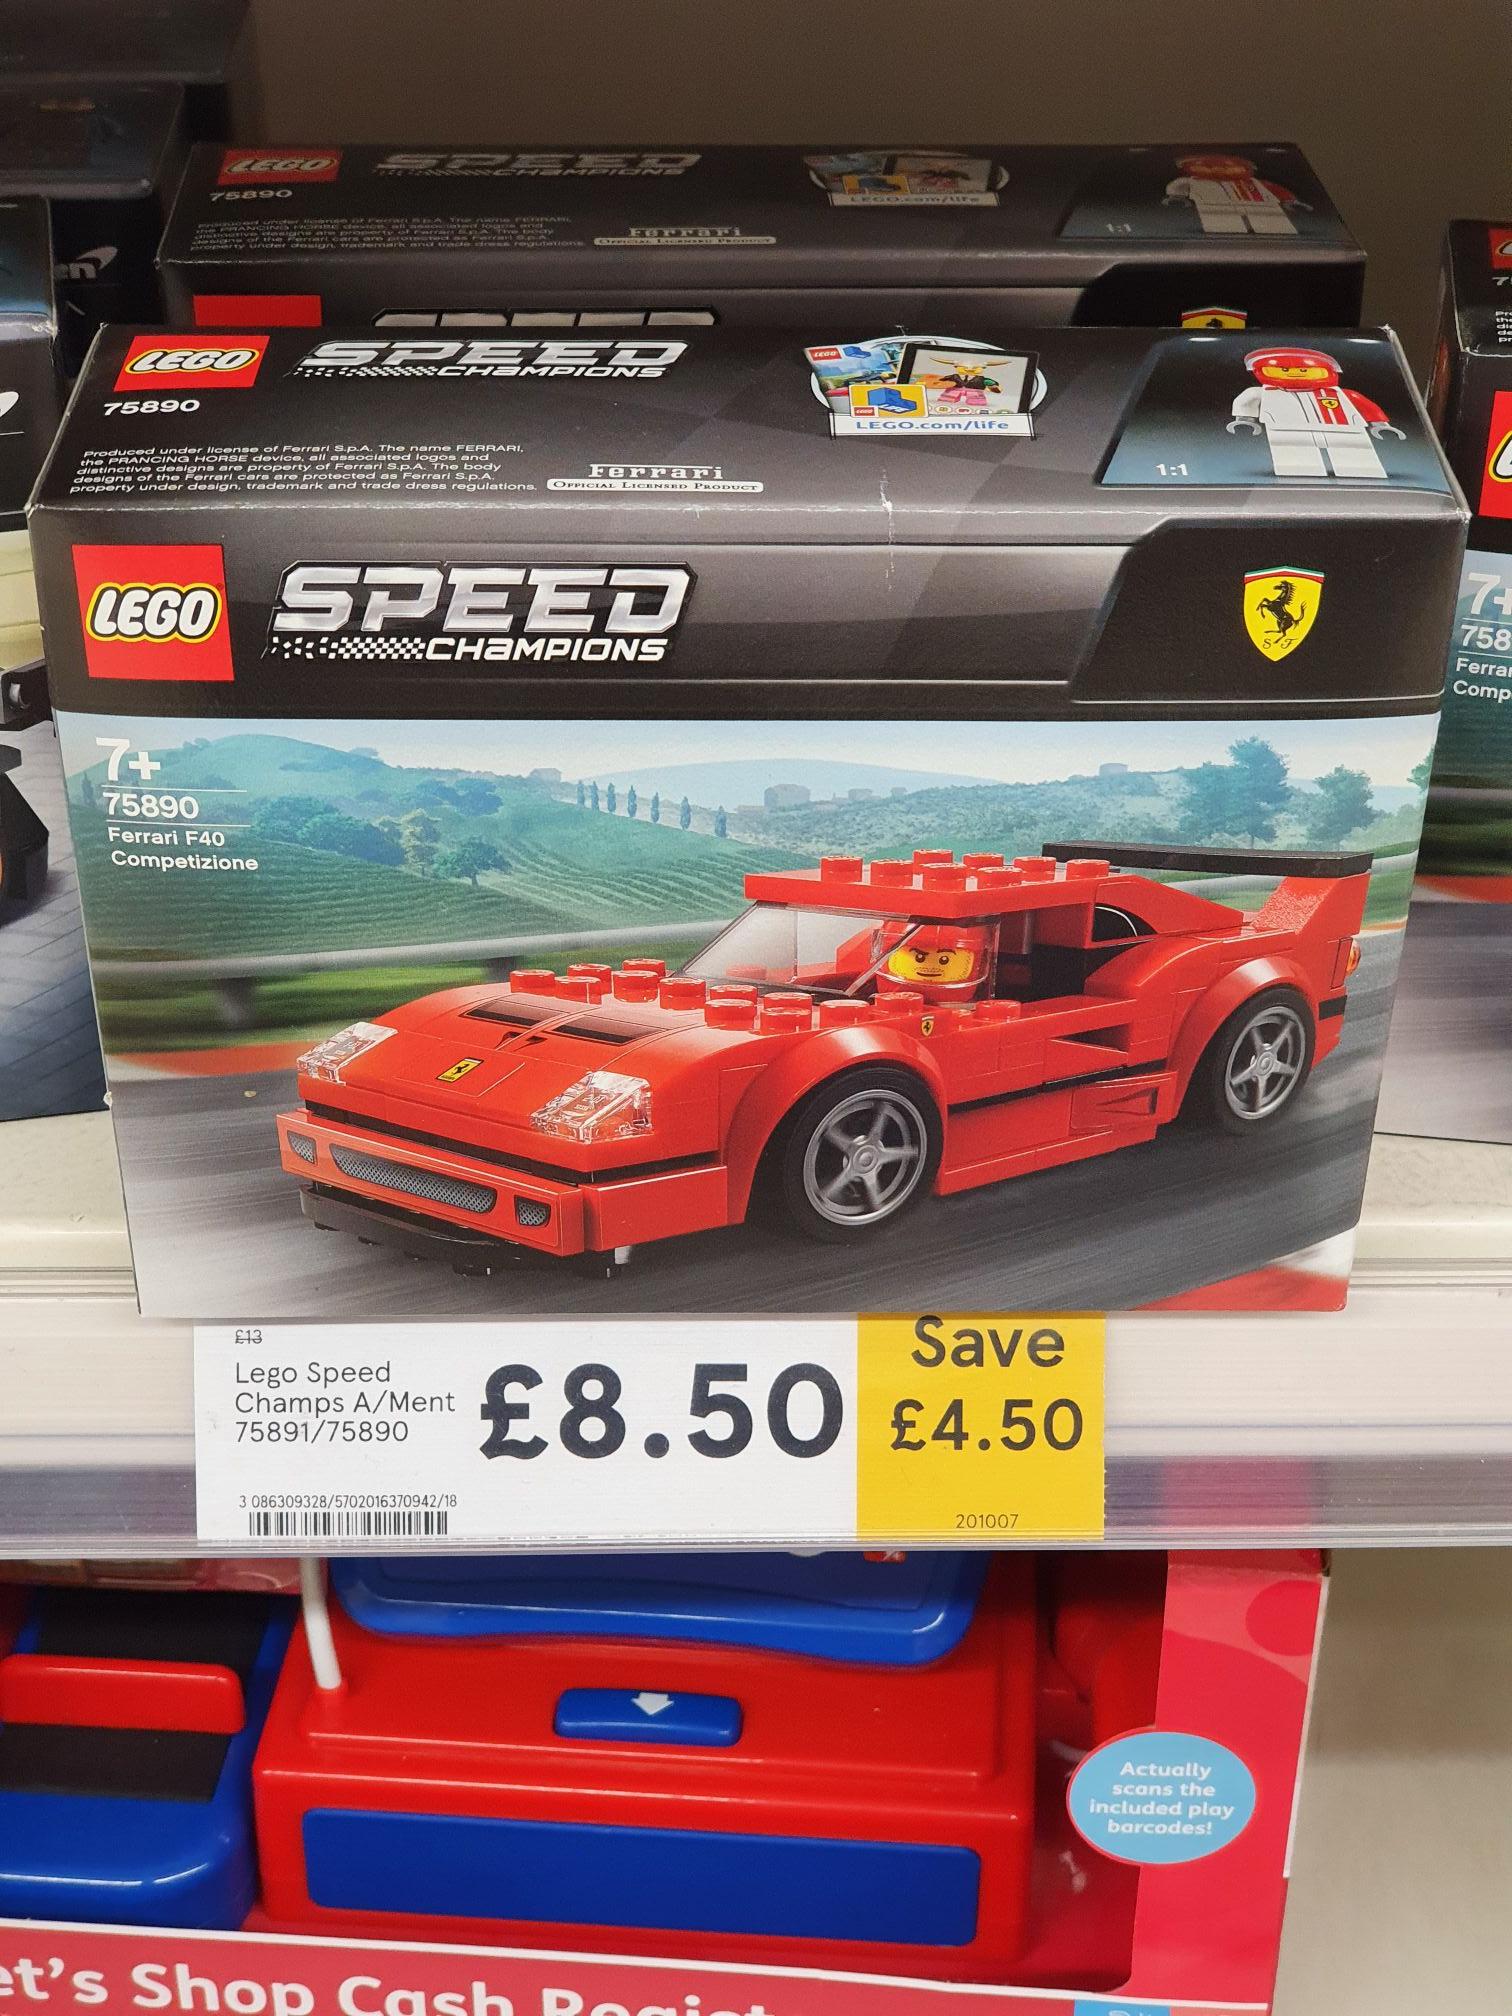 Lego Speed Champions 75890 / 75891 Ferrari F40 / Chevrolet Camaro @ Tesco, Montrose, Scotland